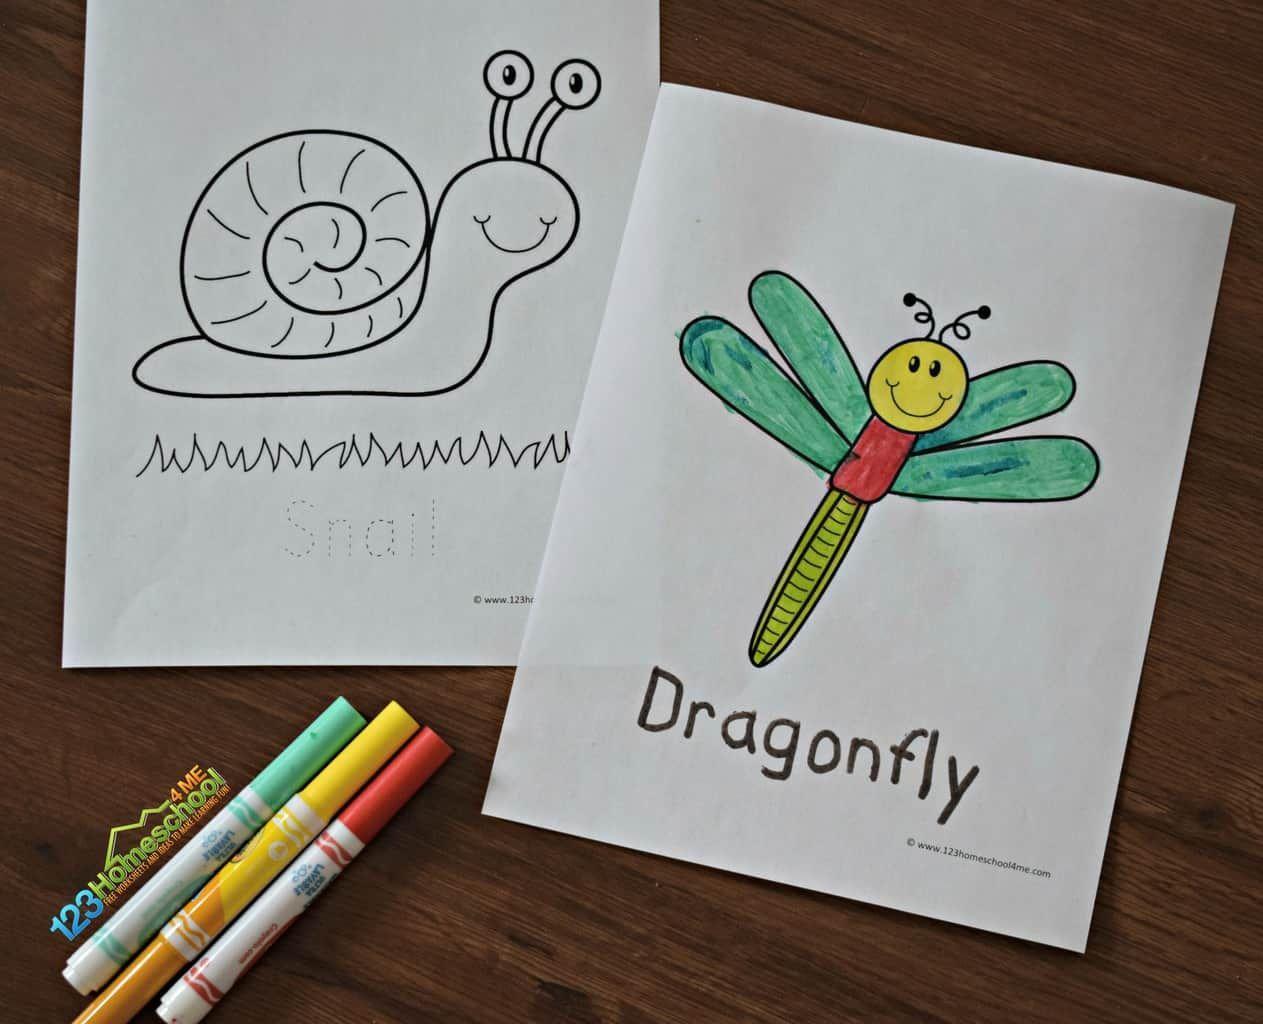 FREE Bug Coloring Pages | Bug coloring pages, Coloring ...